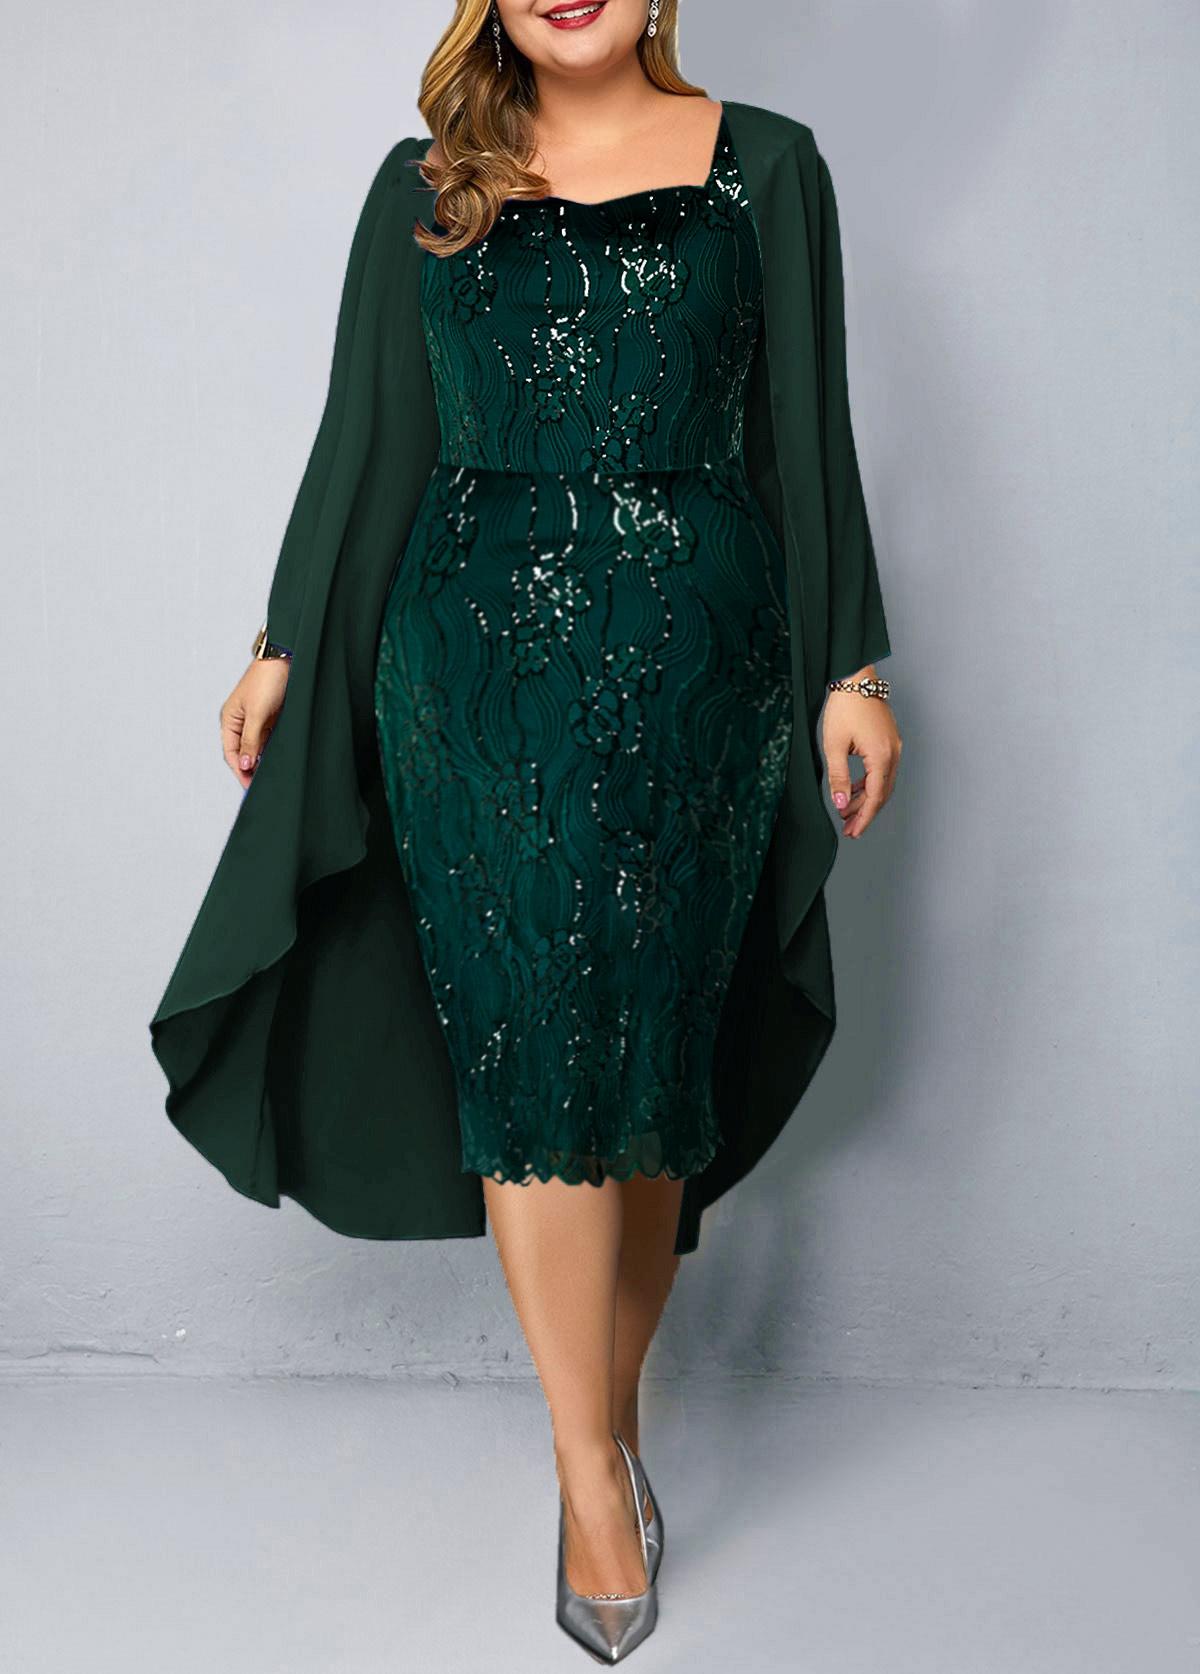 Chiffon Cardigan and Sequin Embellished Plus Size Dress